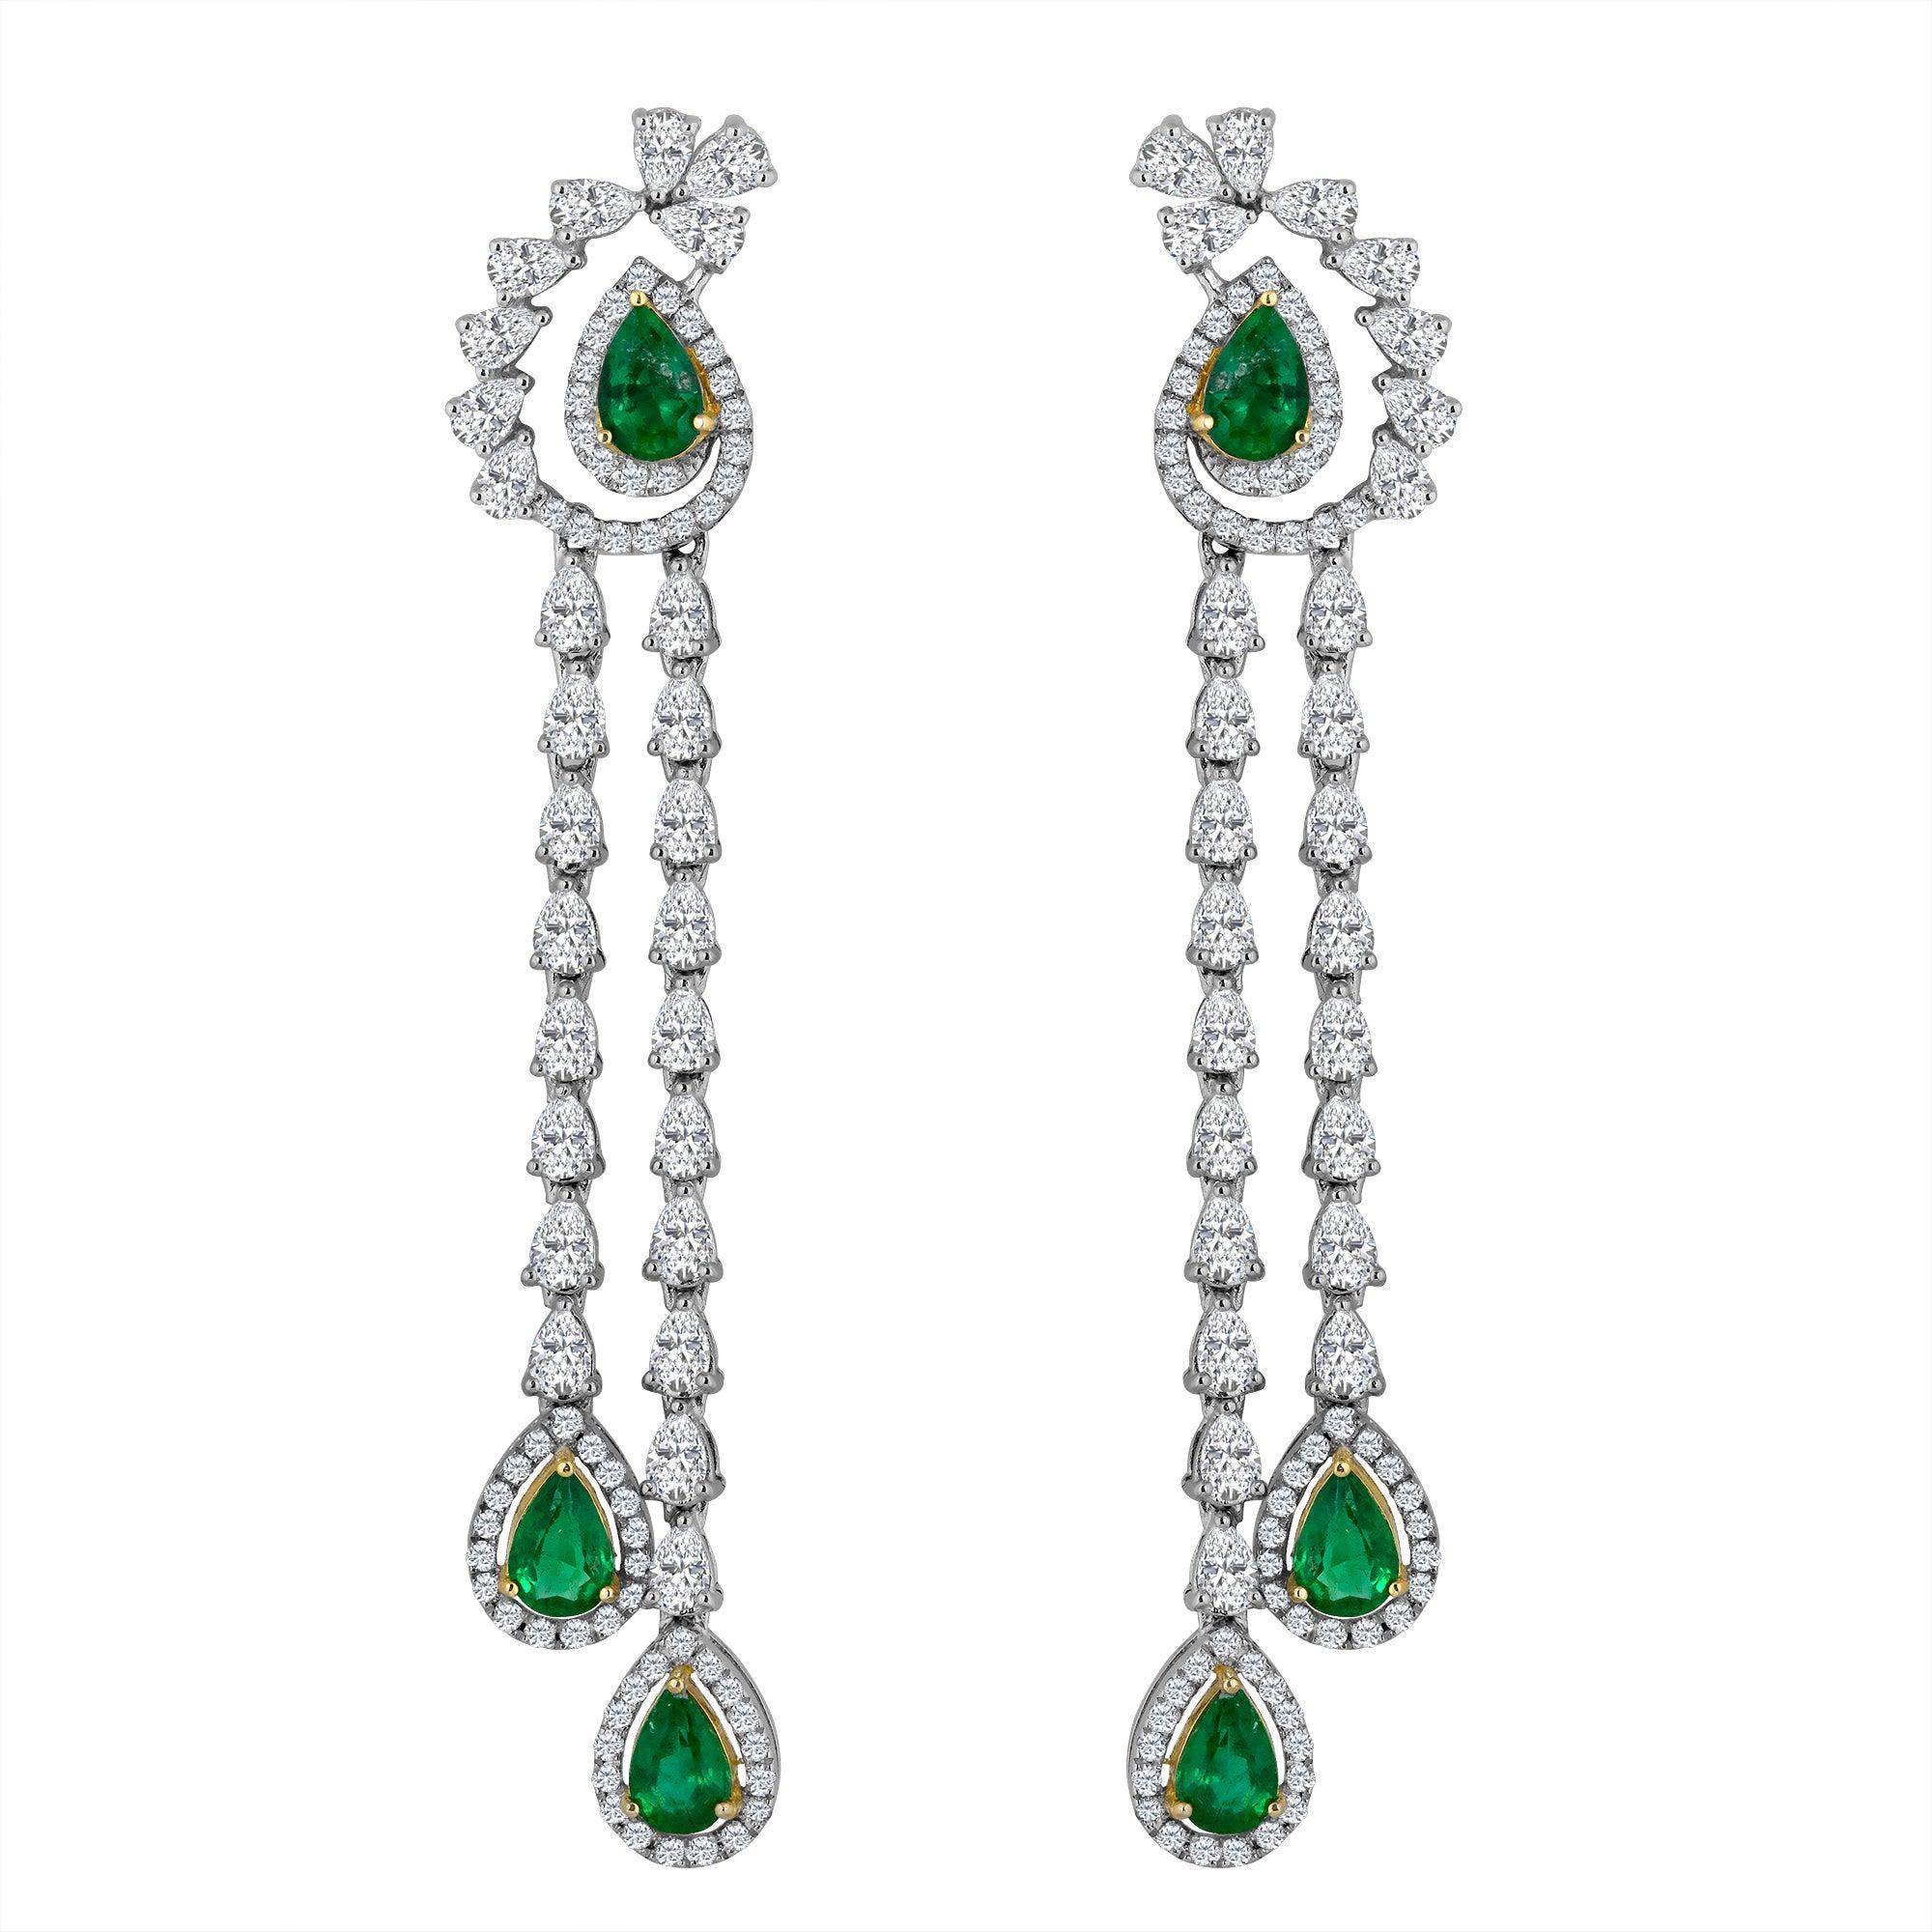 Emilio Jewelry 6.37 Carat Emerald Diamond Earrings